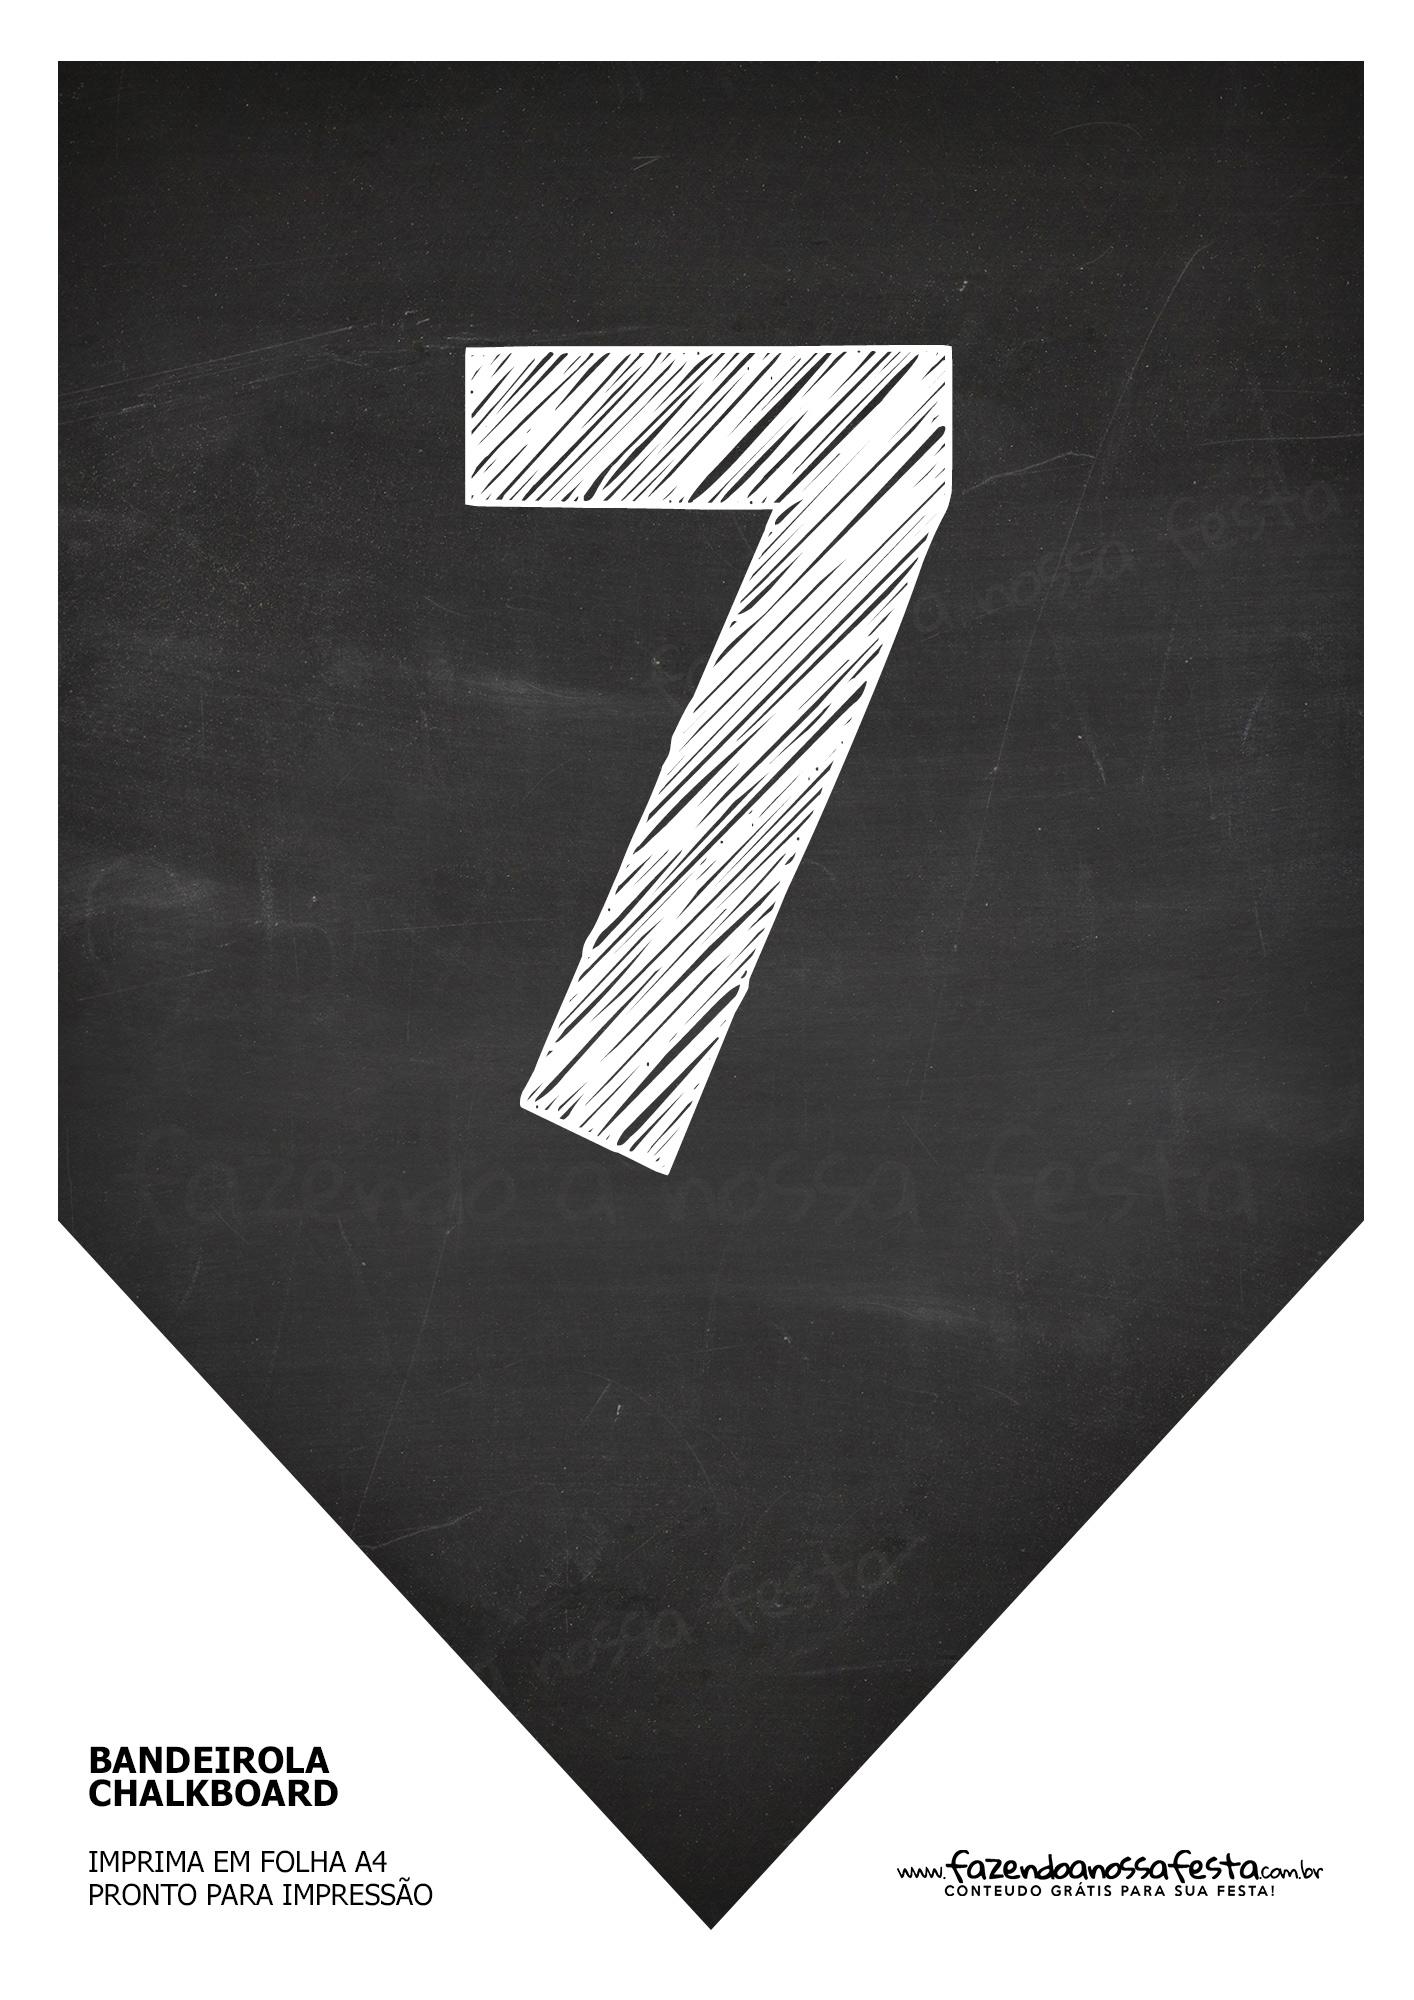 Bandeirinha Chalkboard 7